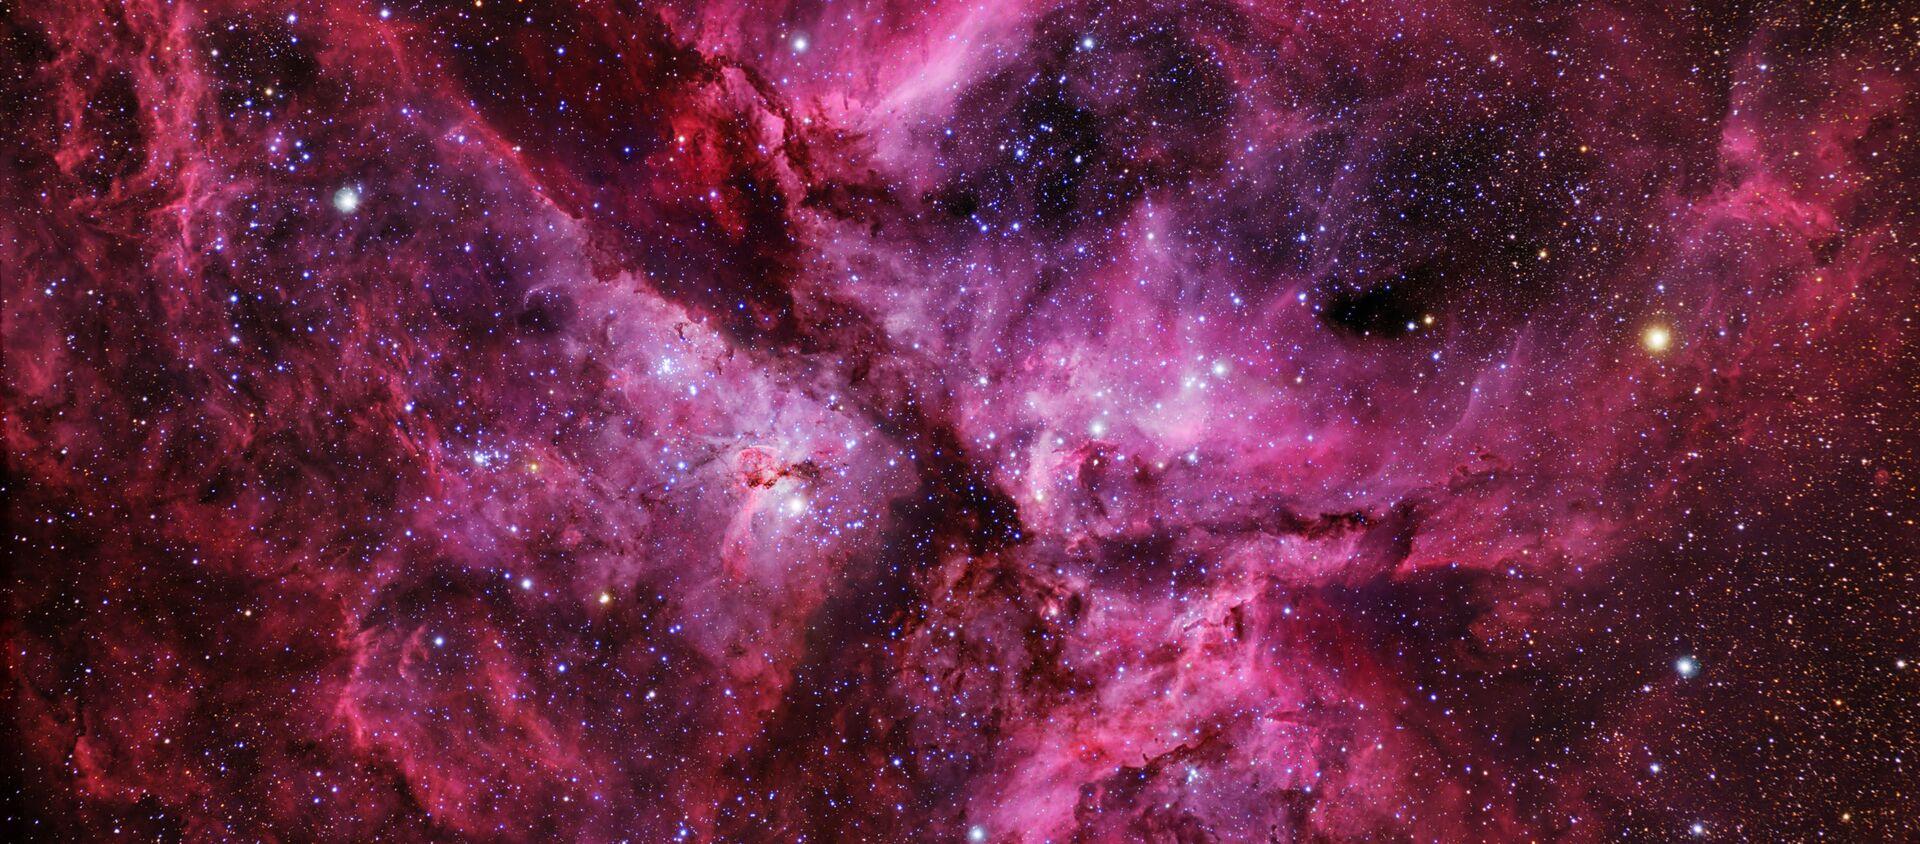 El universo (imagen referencial) - Sputnik Mundo, 1920, 09.12.2020